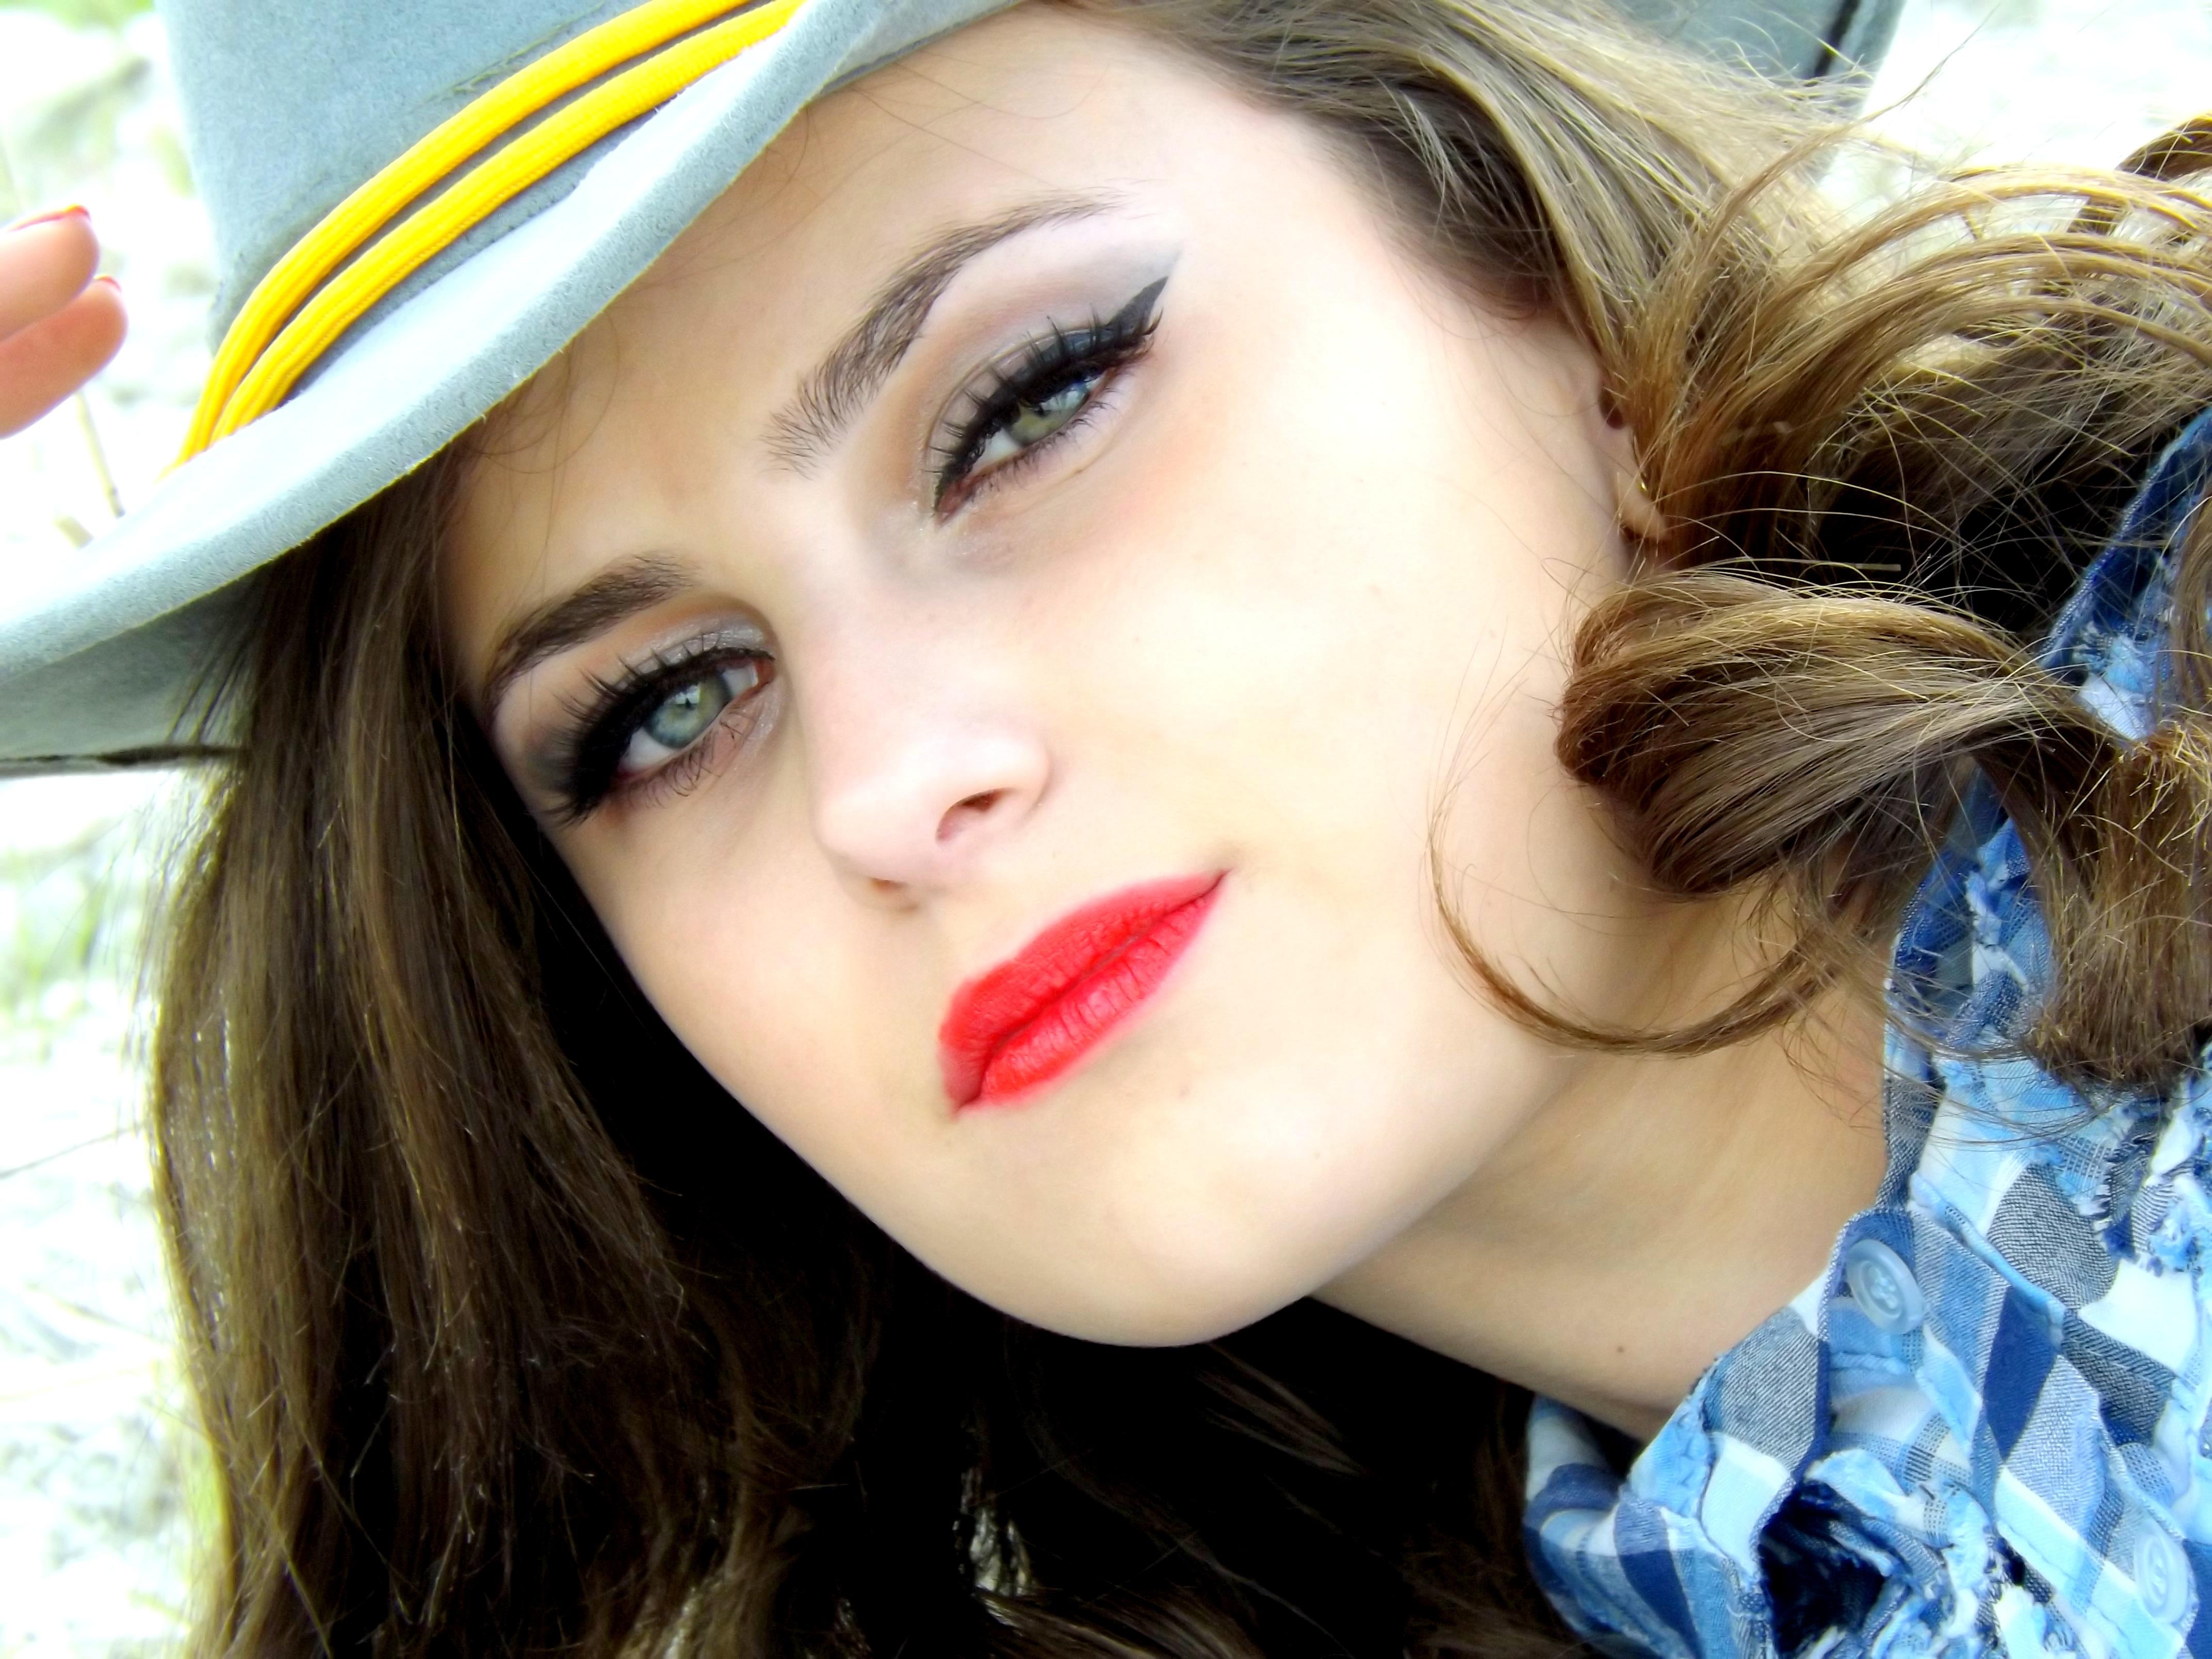 Gambar orang gadis model musim semi mode biru wanita mainan cowgirl bibir hairstyle tersenyum rambut panjang merapatkan tubuh manusia